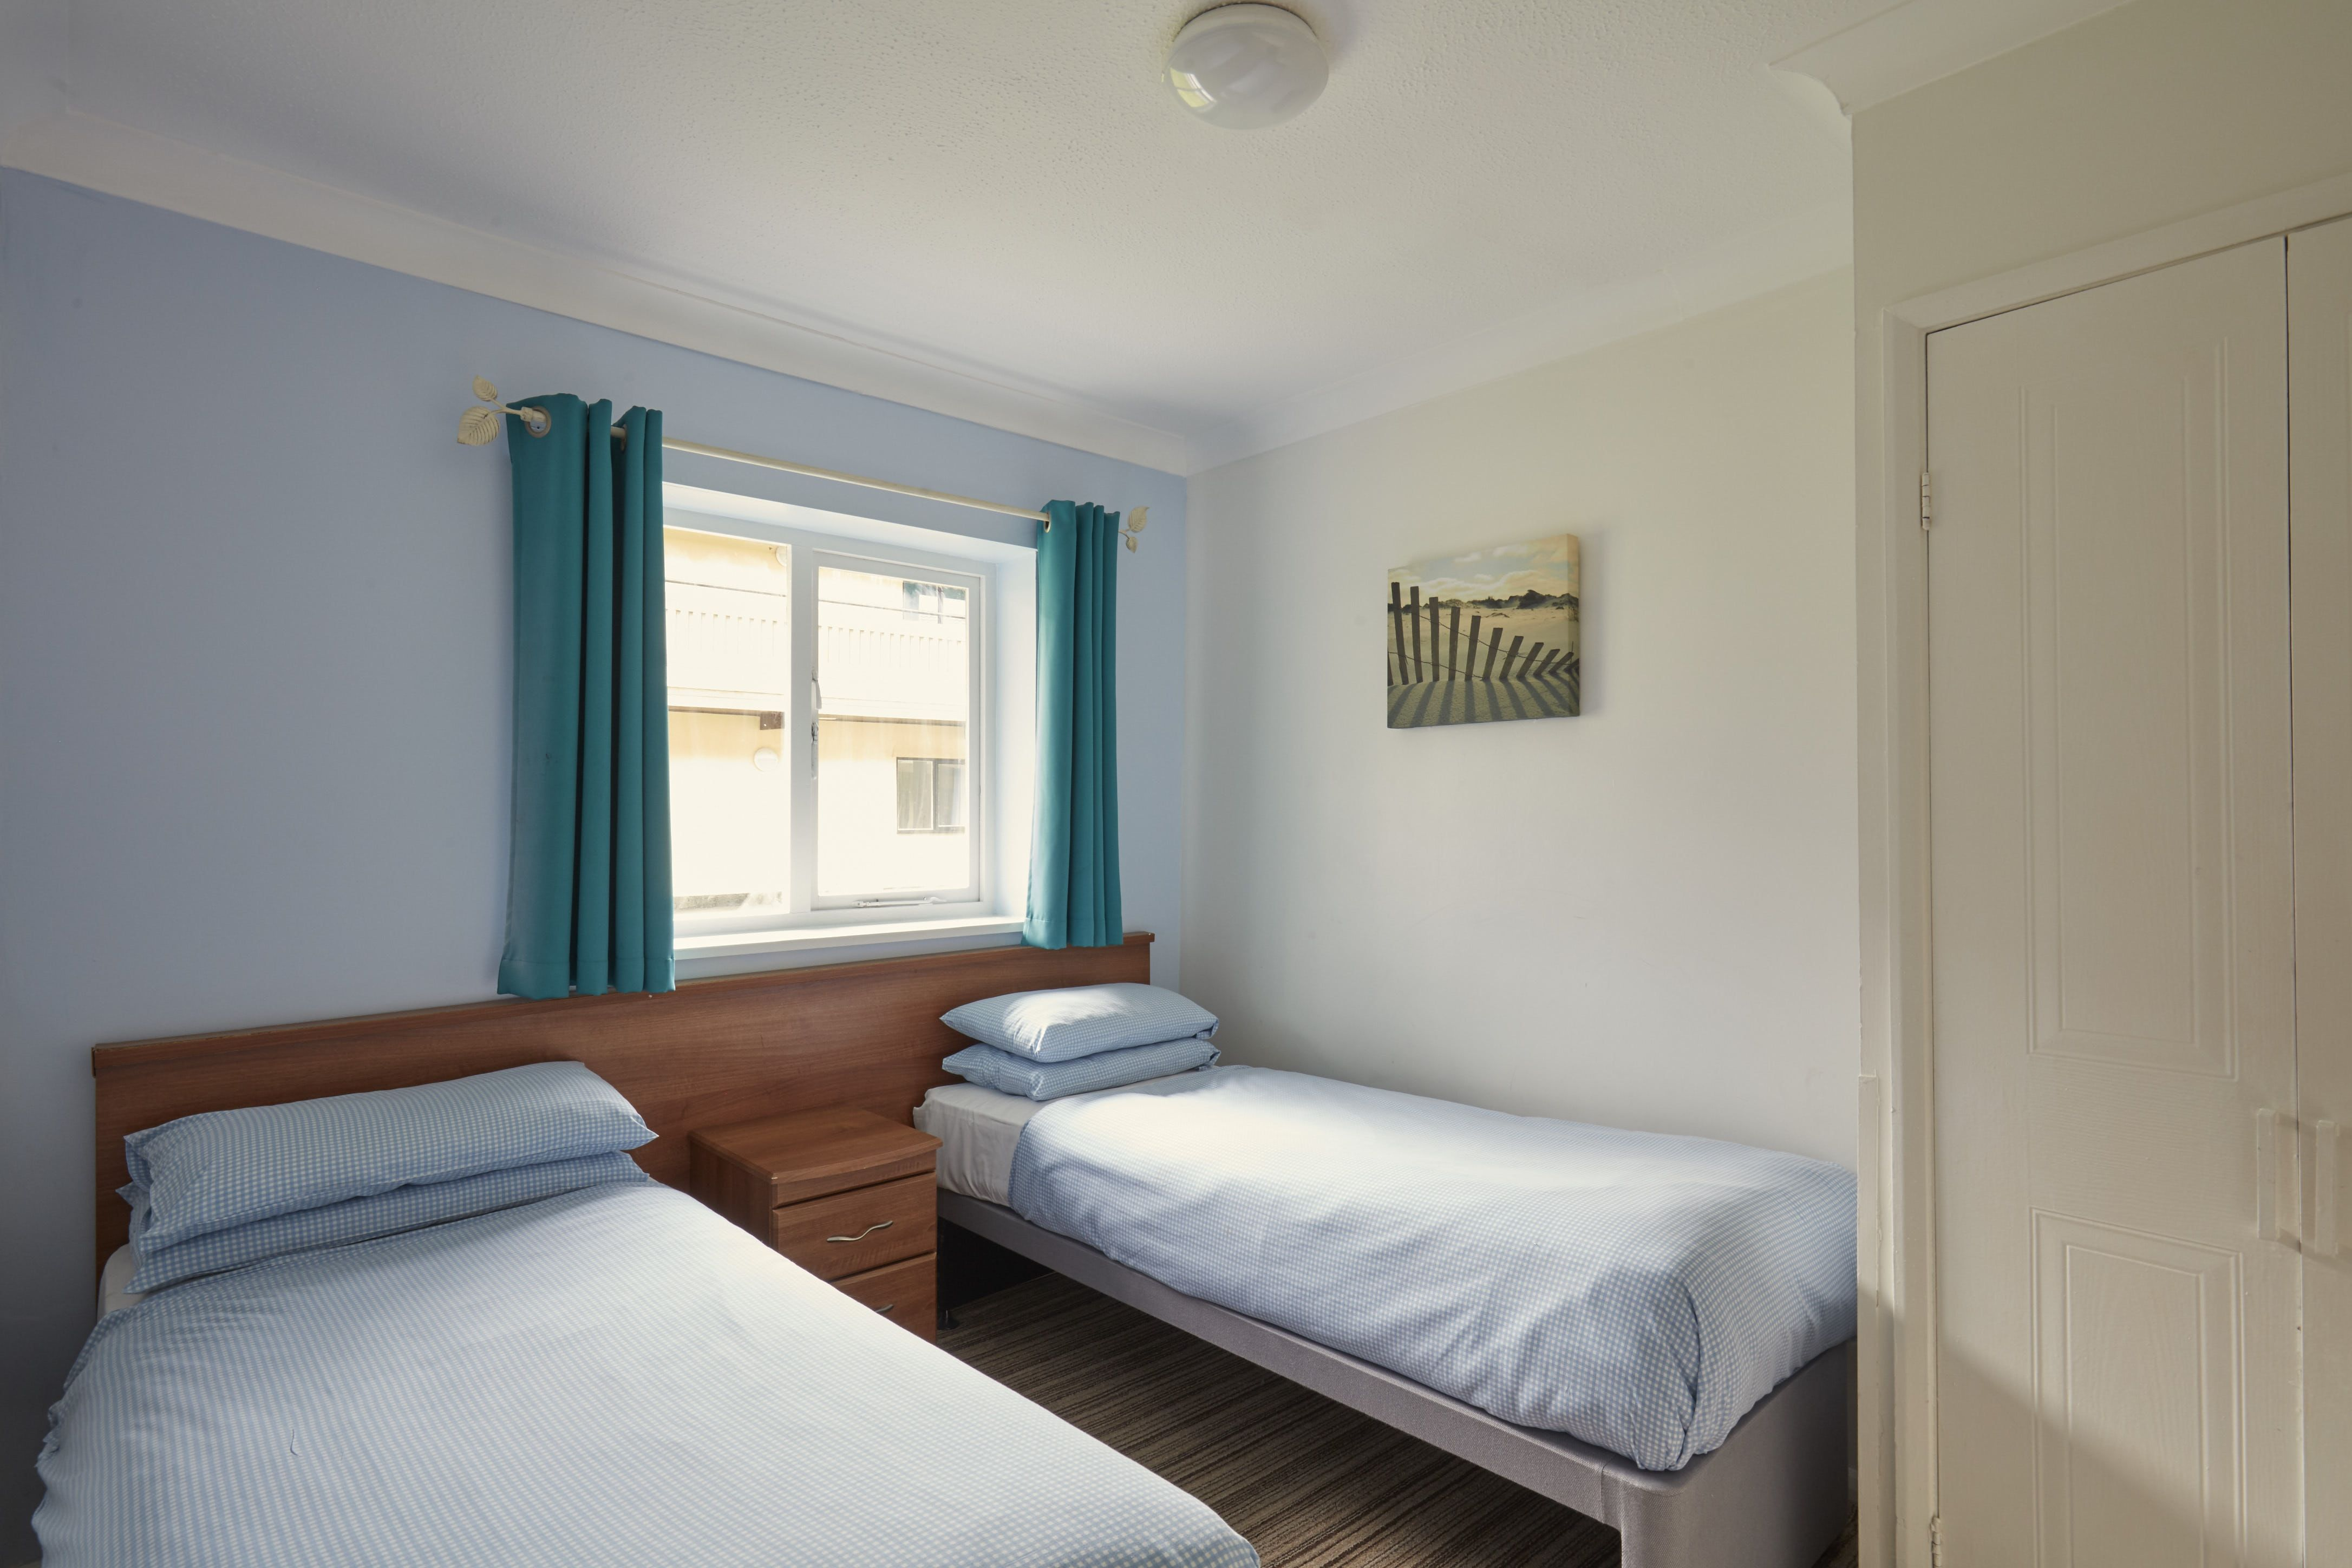 Standard Apartments Accommodation Minehead Resorts Butlin S